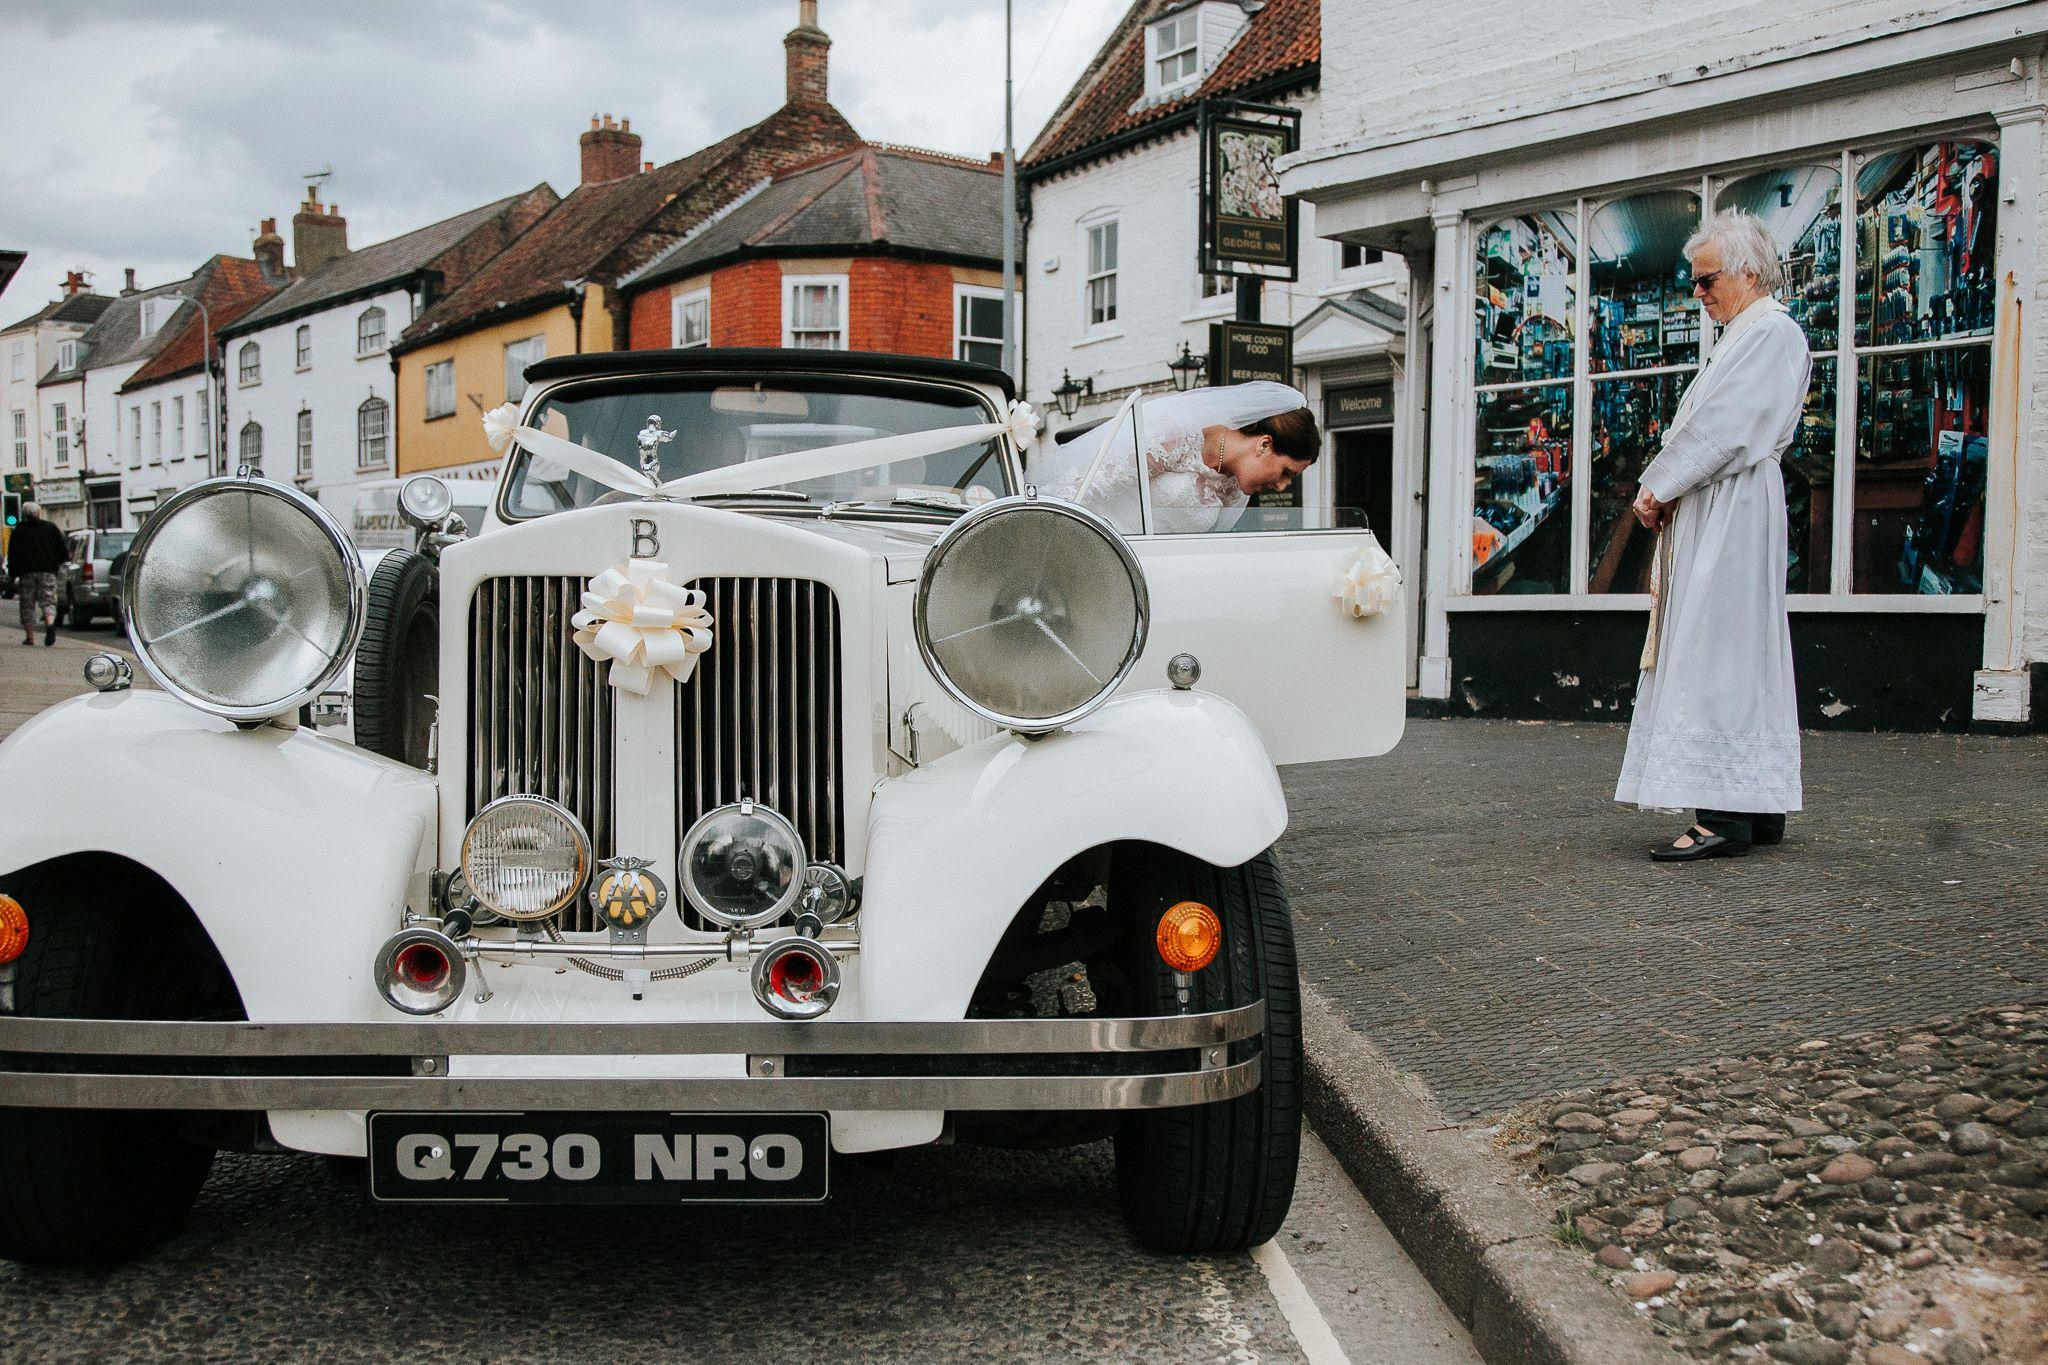 nottinghamshire-documentary-wedding-photographer-5.jpg